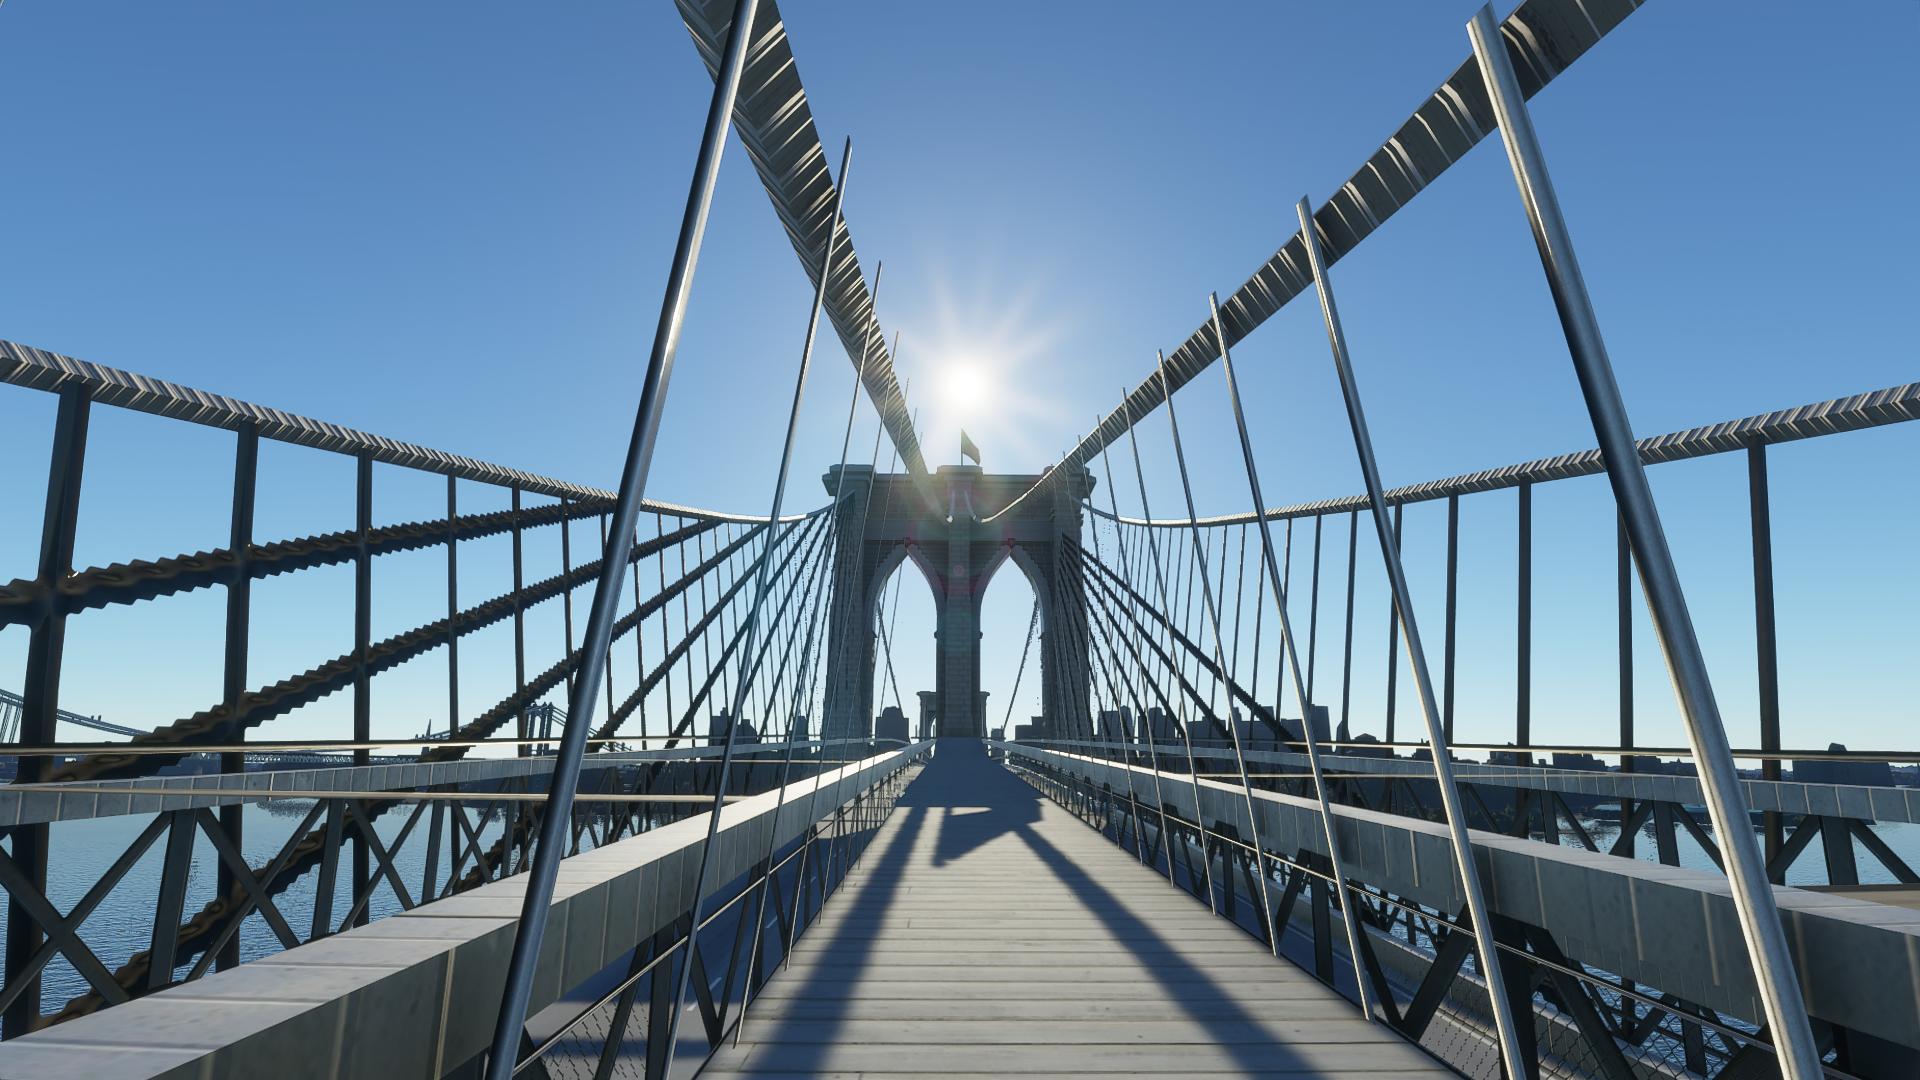 The Brooklyn Bridge in Microsoft Flight Simulator